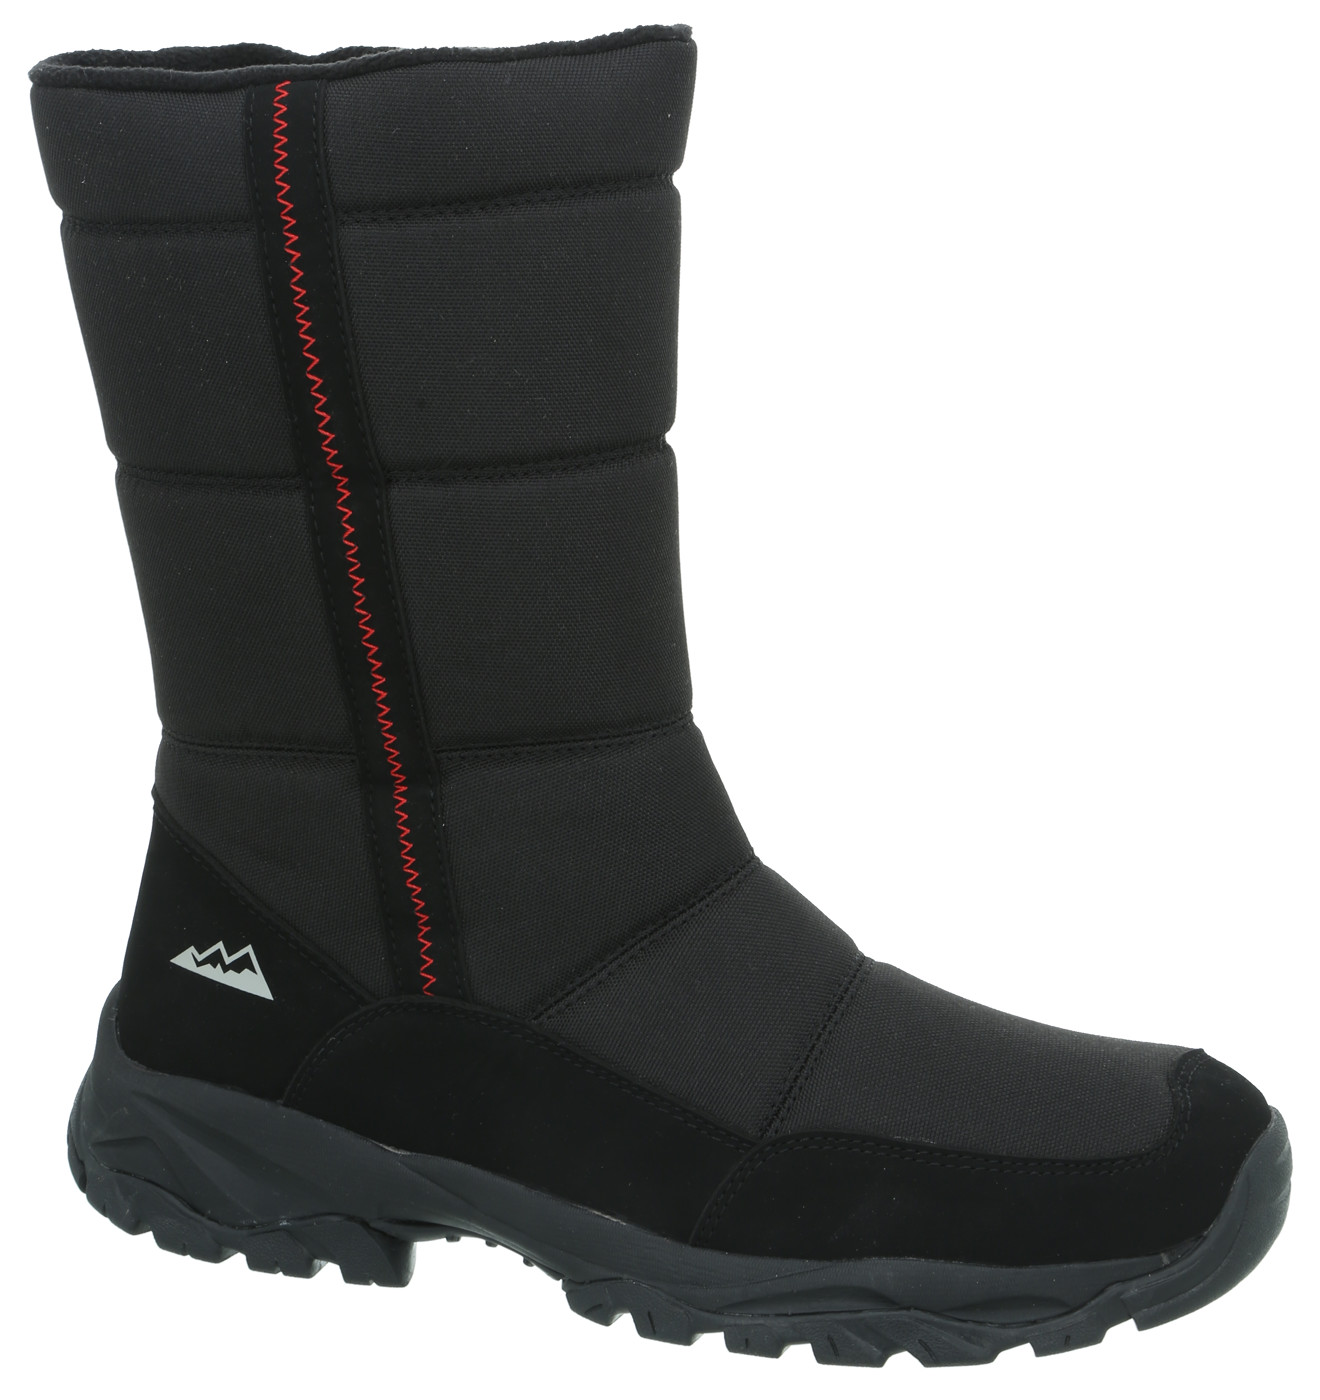 HIGH COLORADO Winterboots POLAR UNISEX